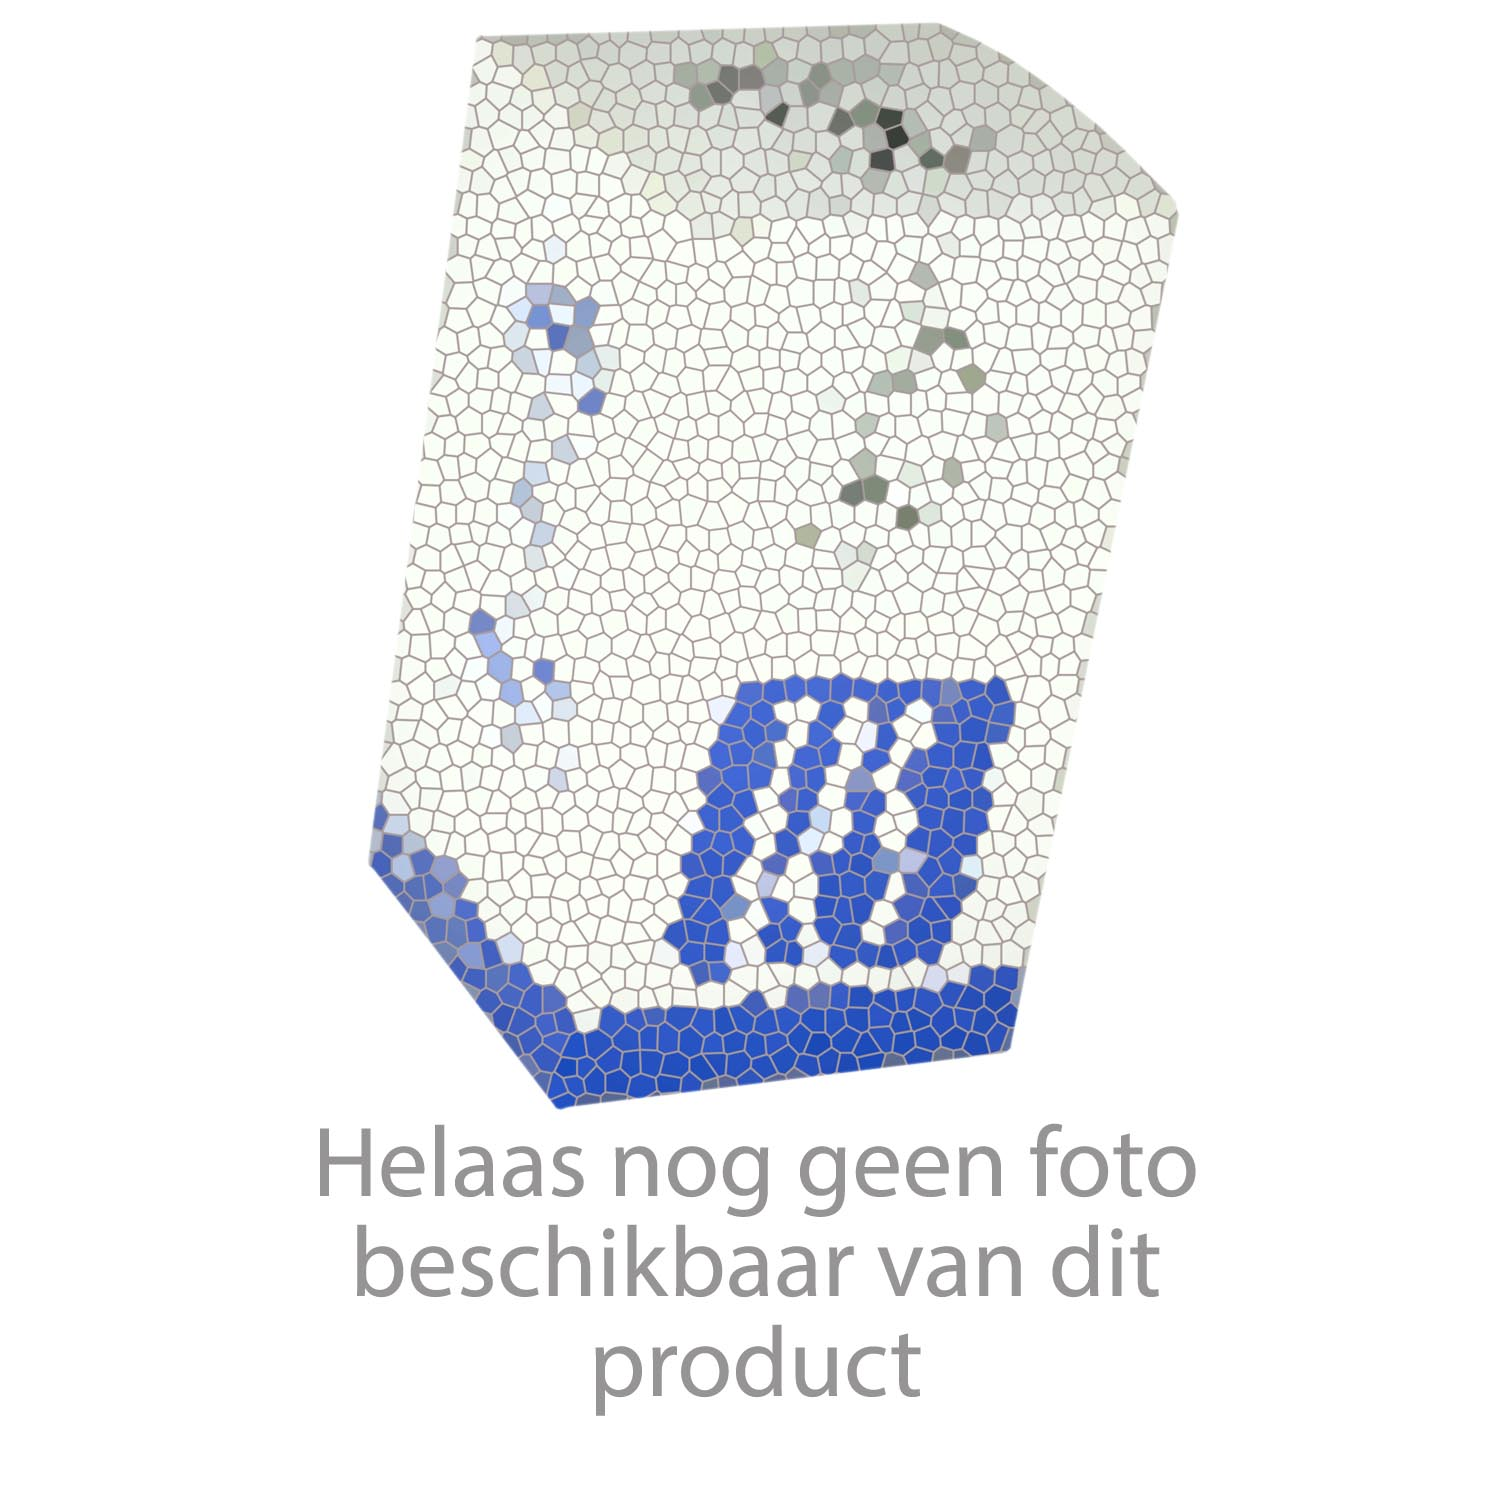 "McALPINE kunststof universeel sifon met komo keur met wasmaschine-aansluiting 6/4""x40mm"